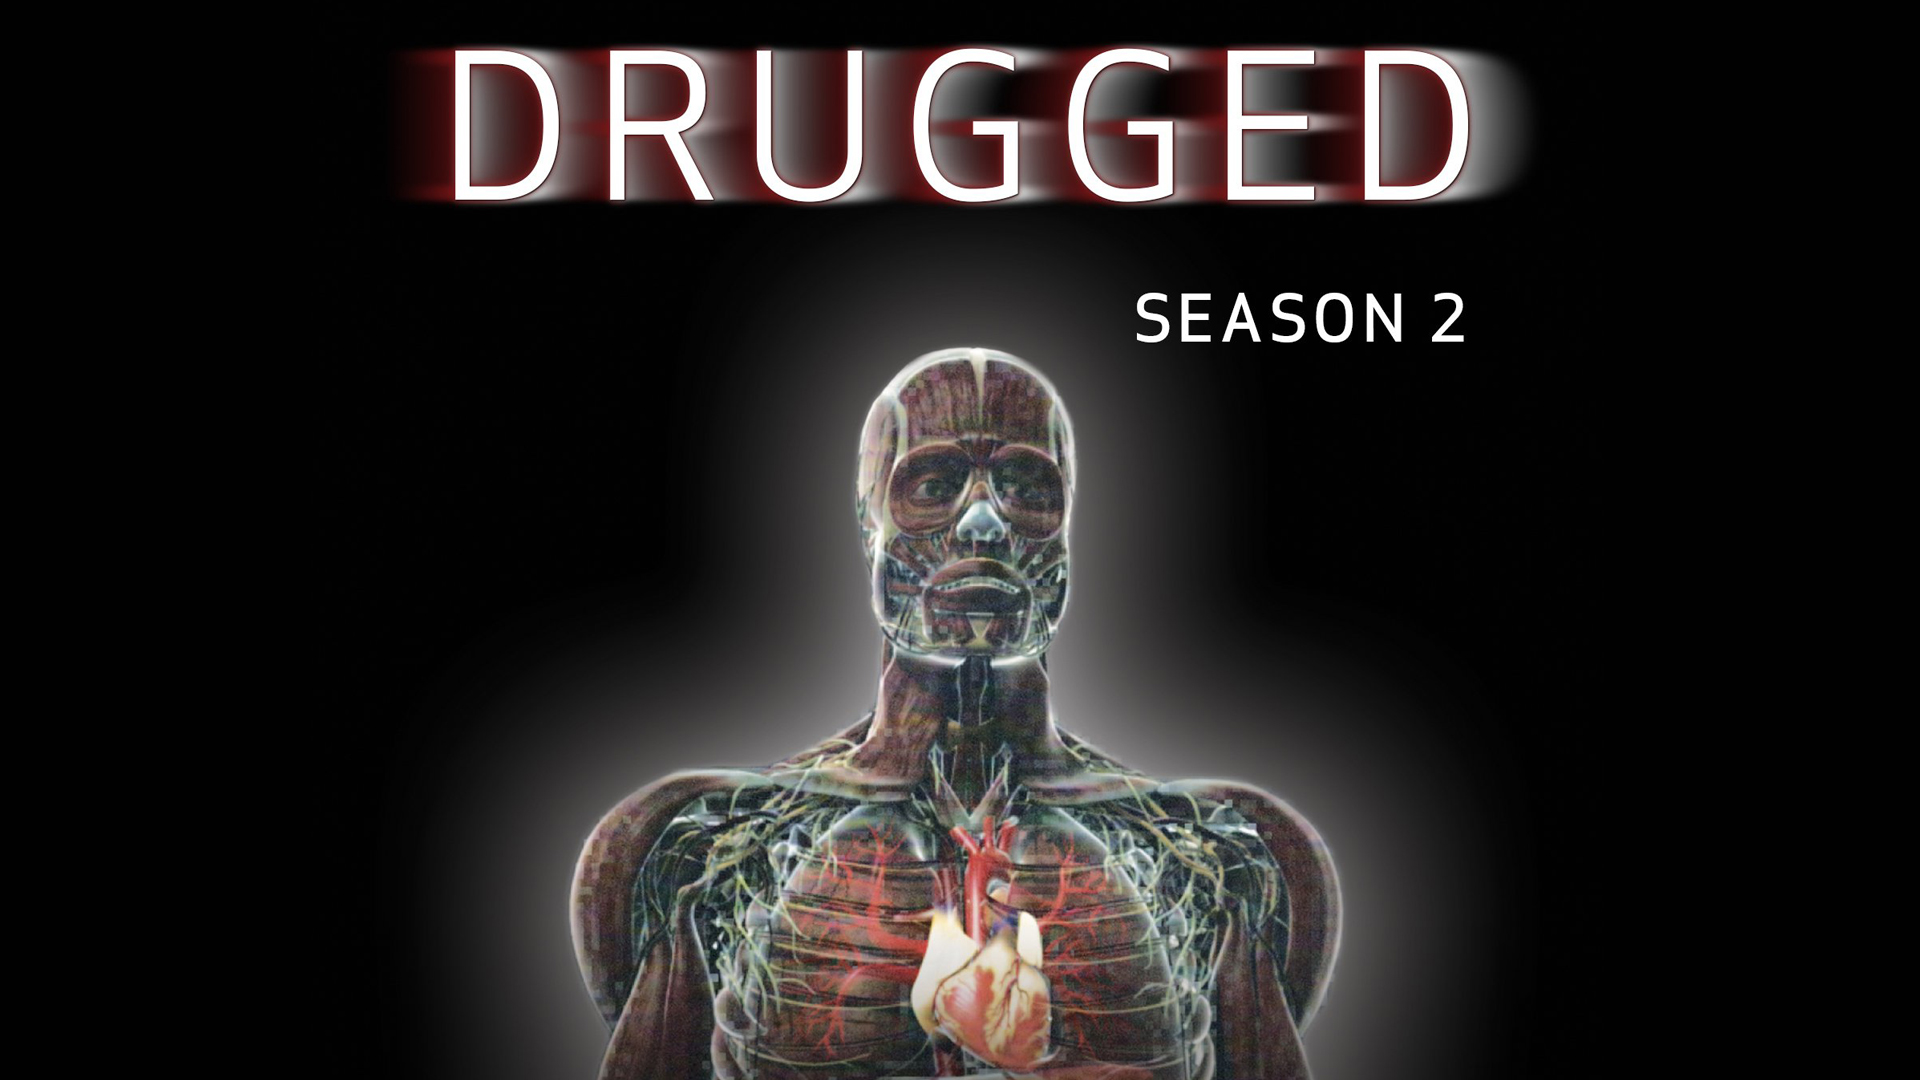 Drugged Season 2